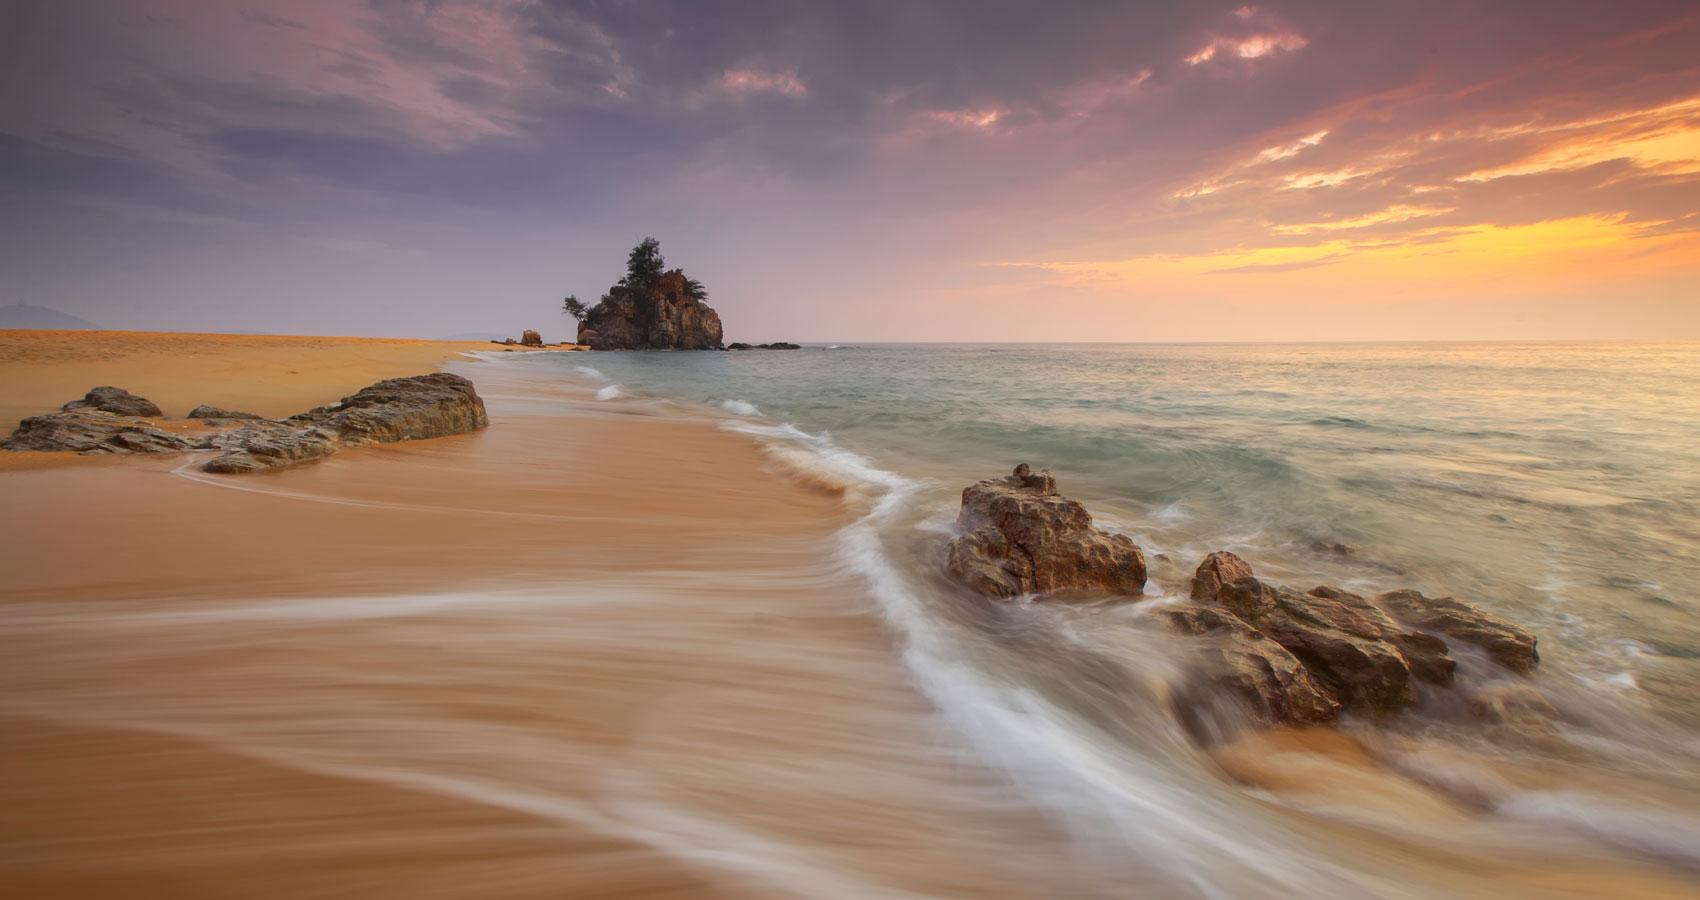 Soy Tempestad Y Tu Playa, written by Uslariono at Spillwords.com